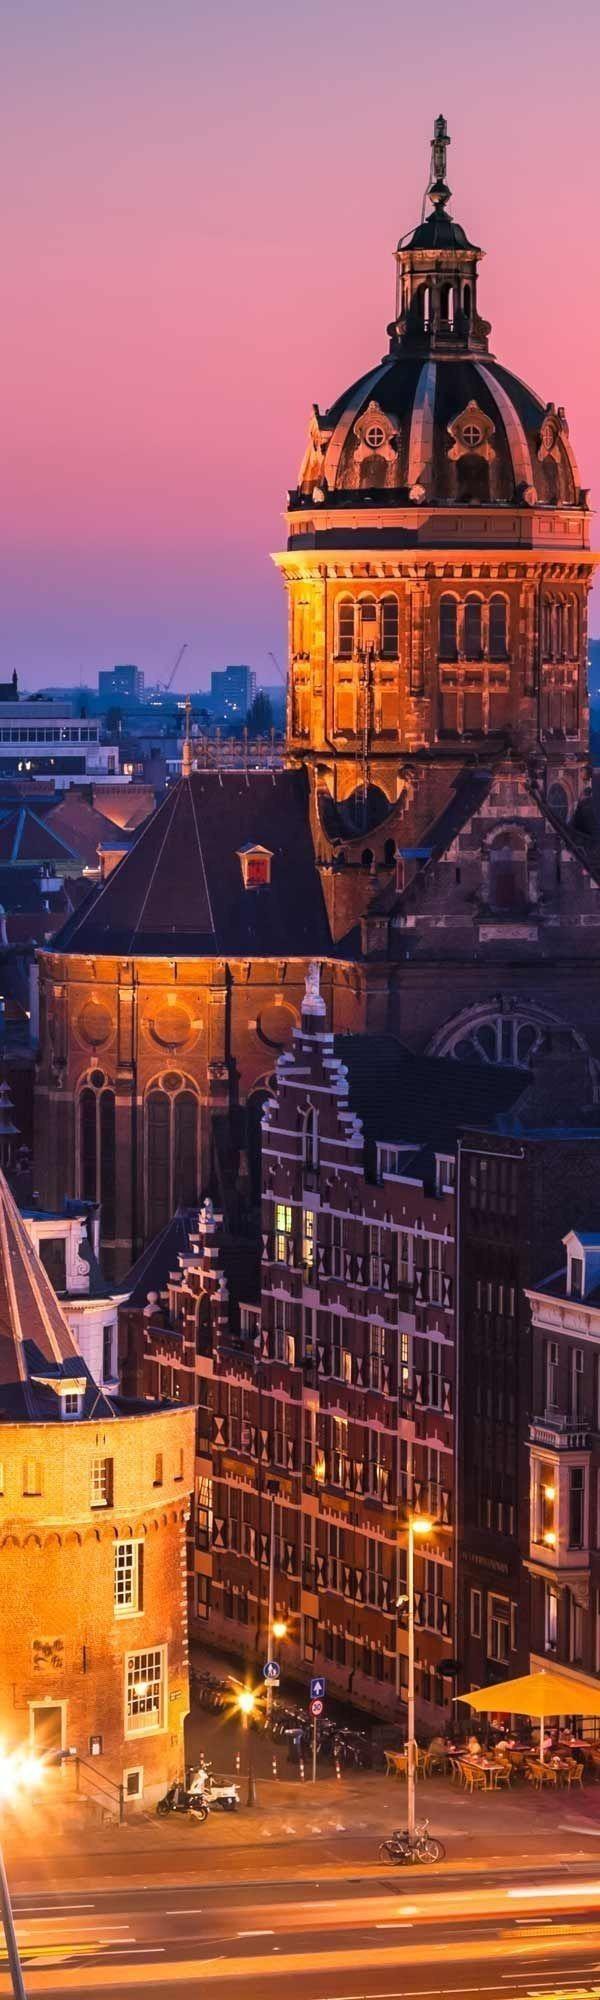 Amsterdam at twilight.